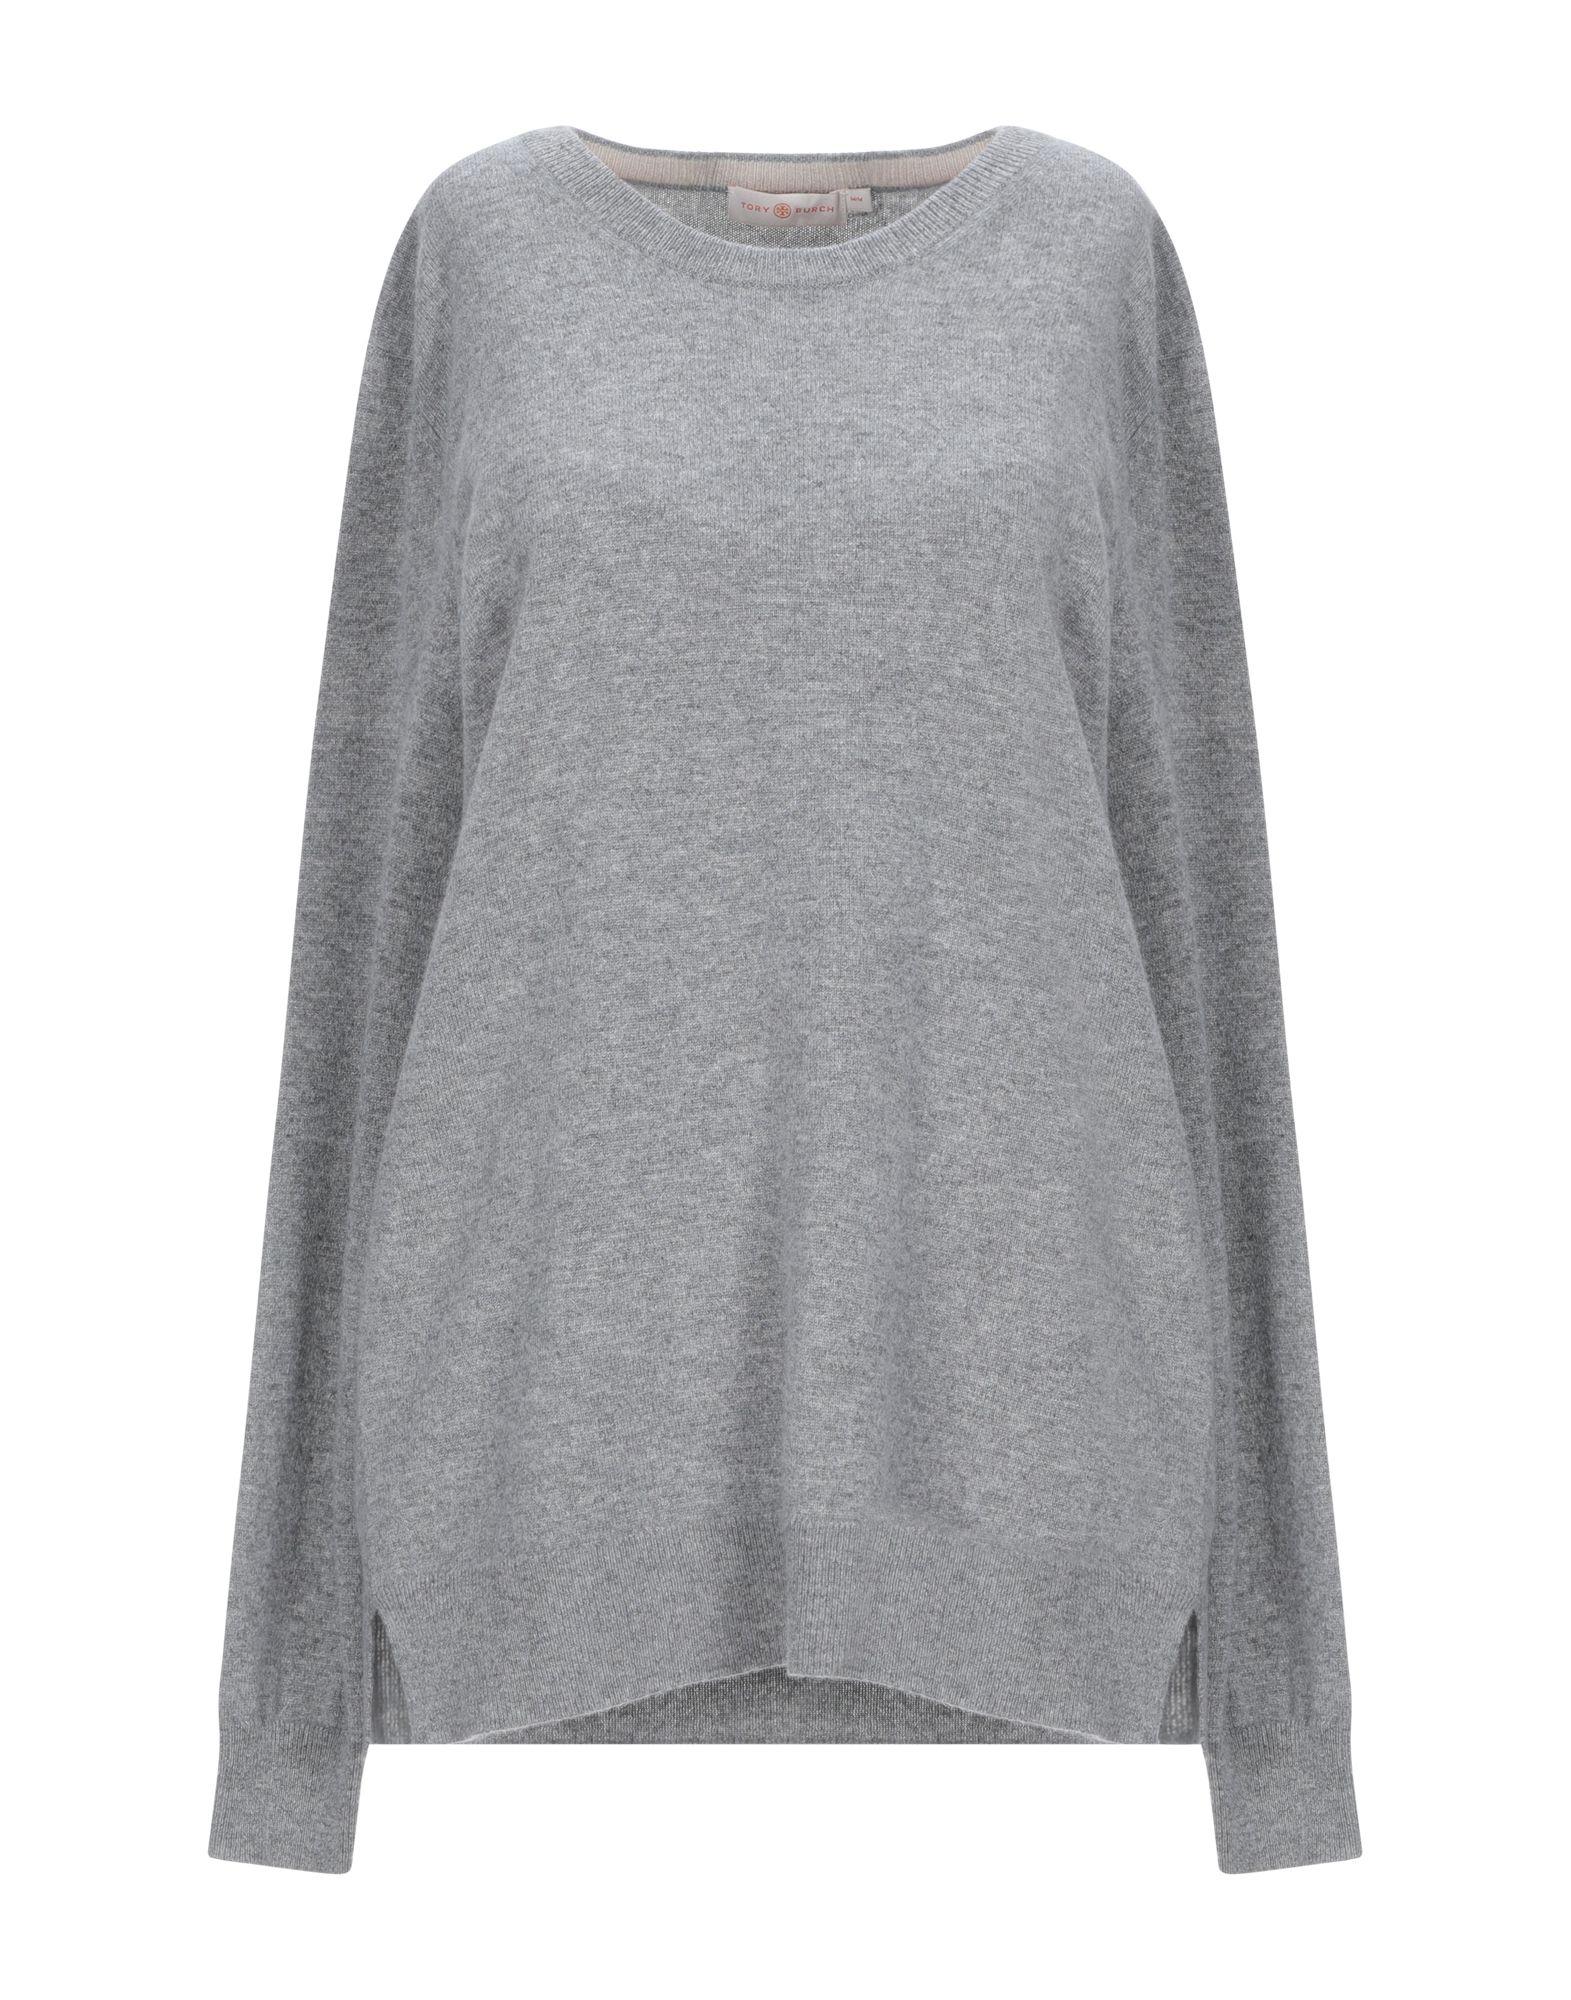 TORY BURCH Sweaters - Item 14074955